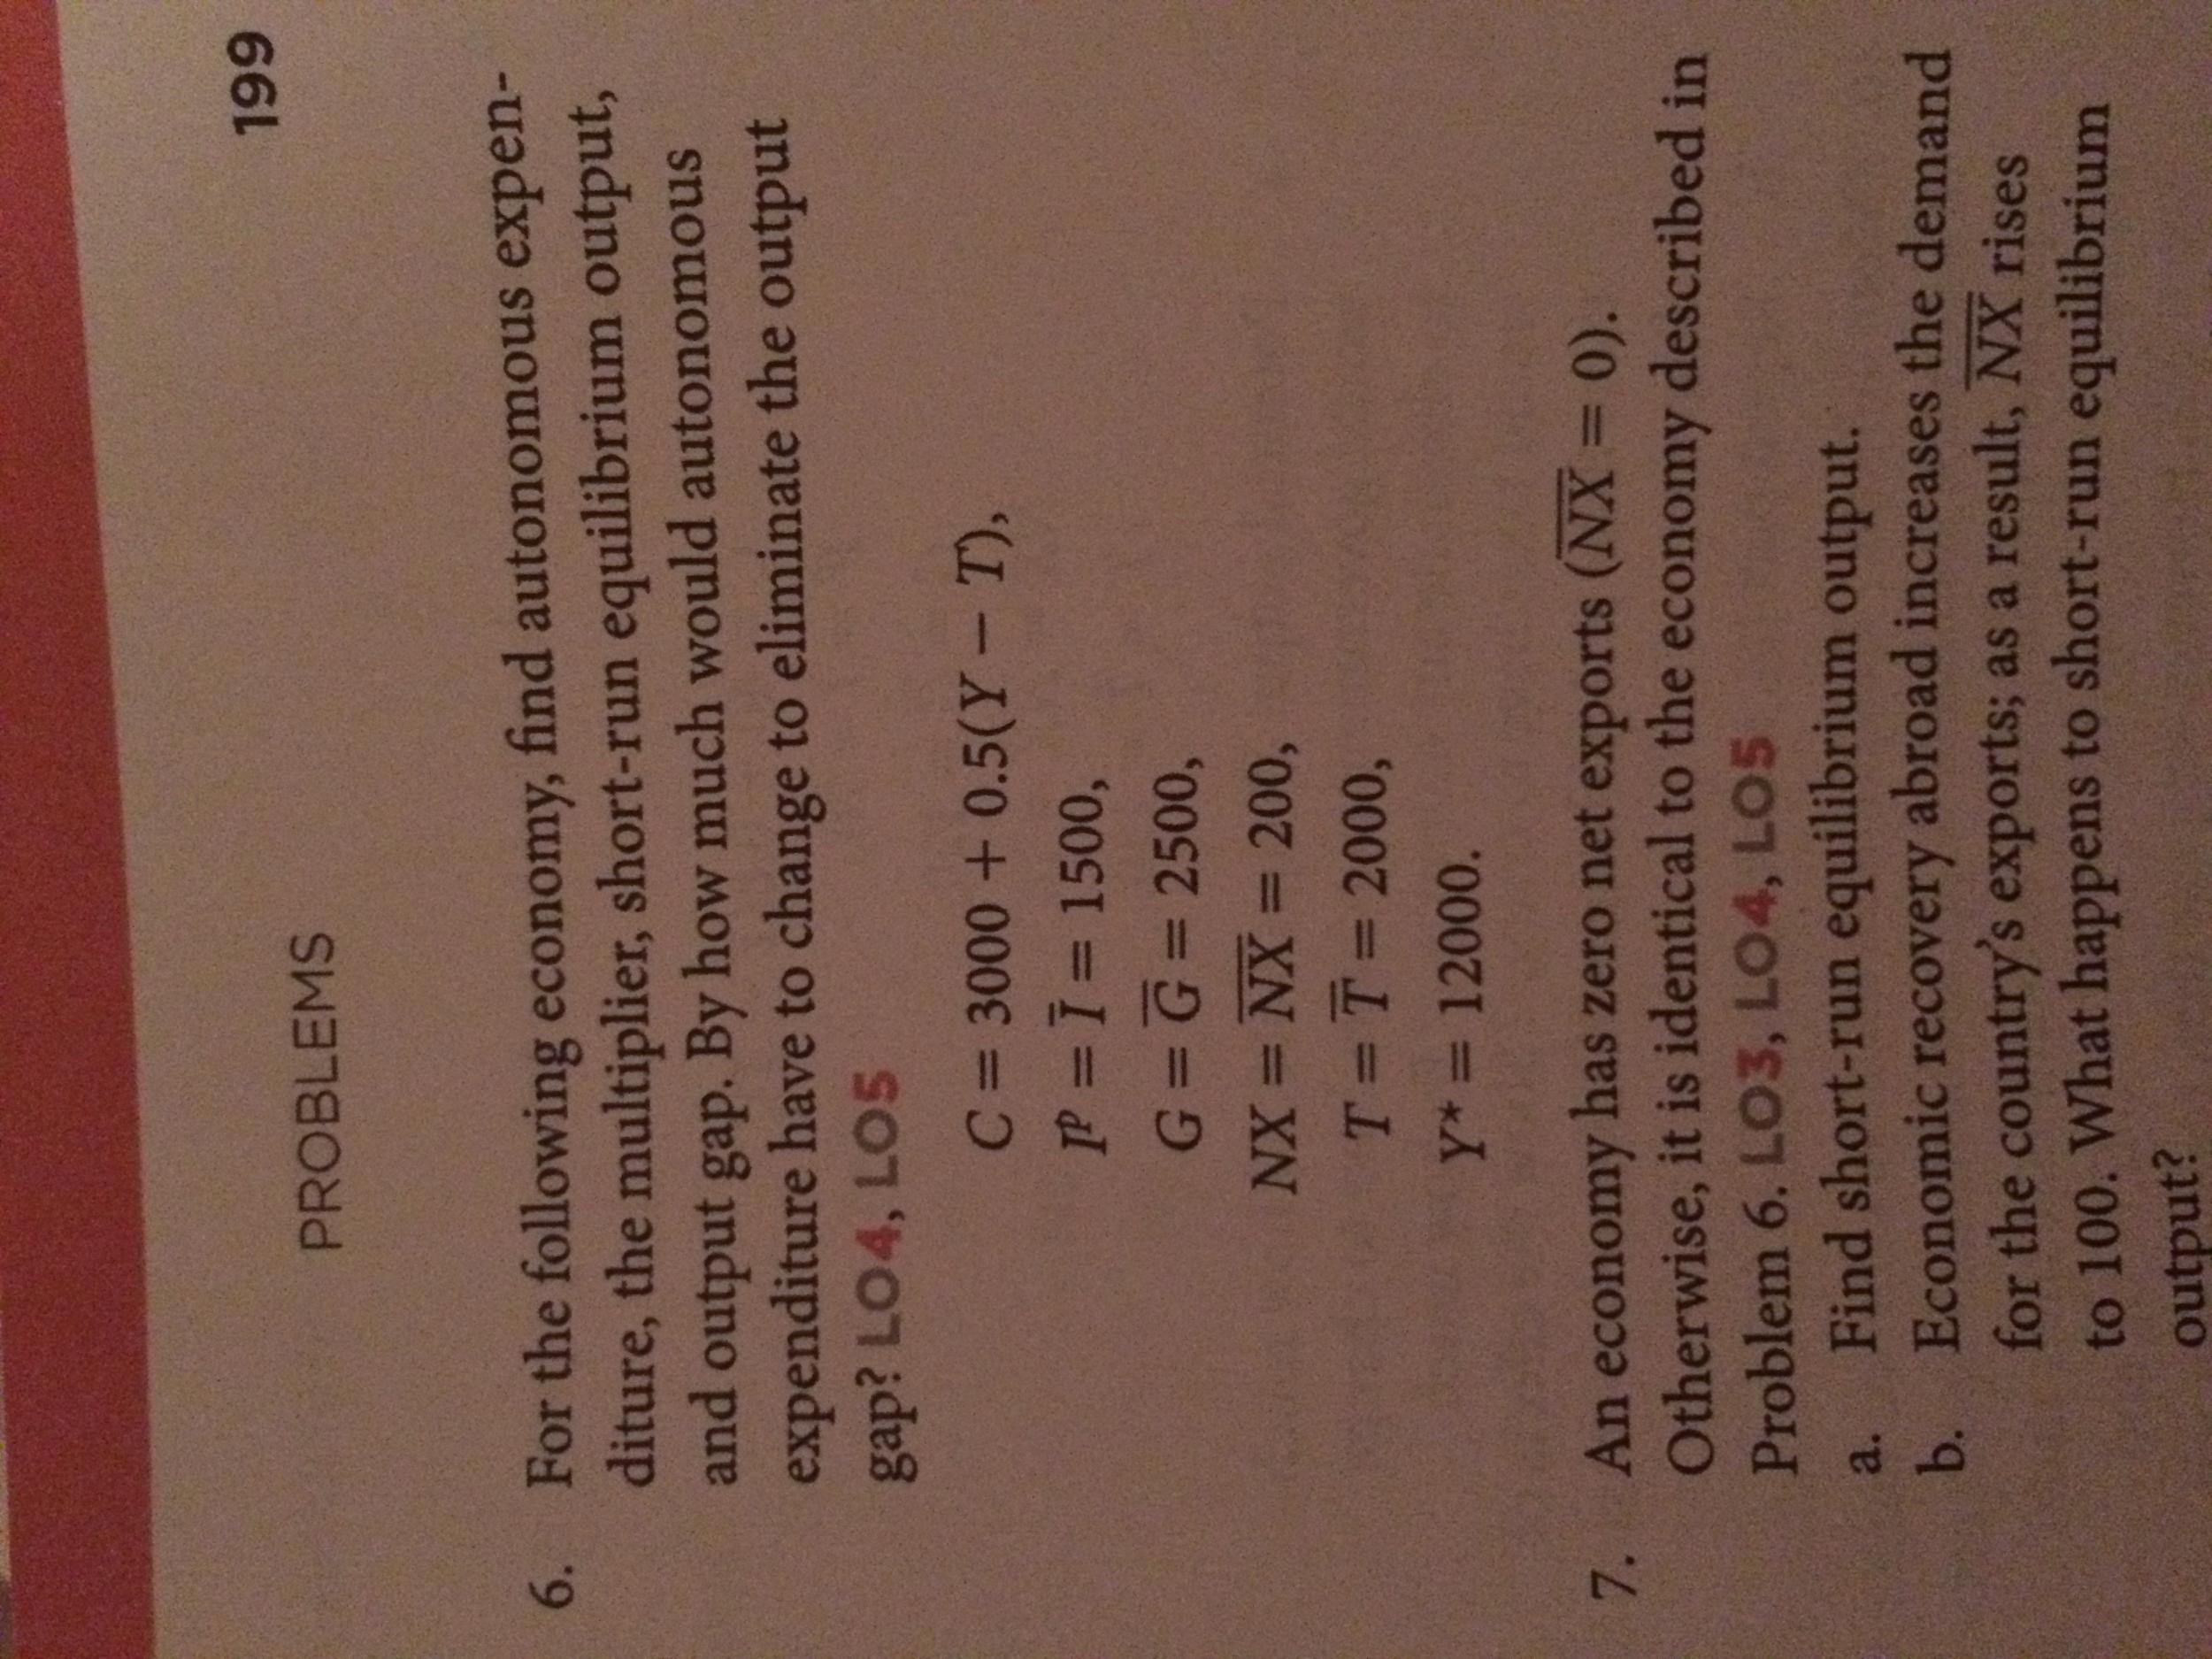 Principles of microeconomics frank 4th edition.